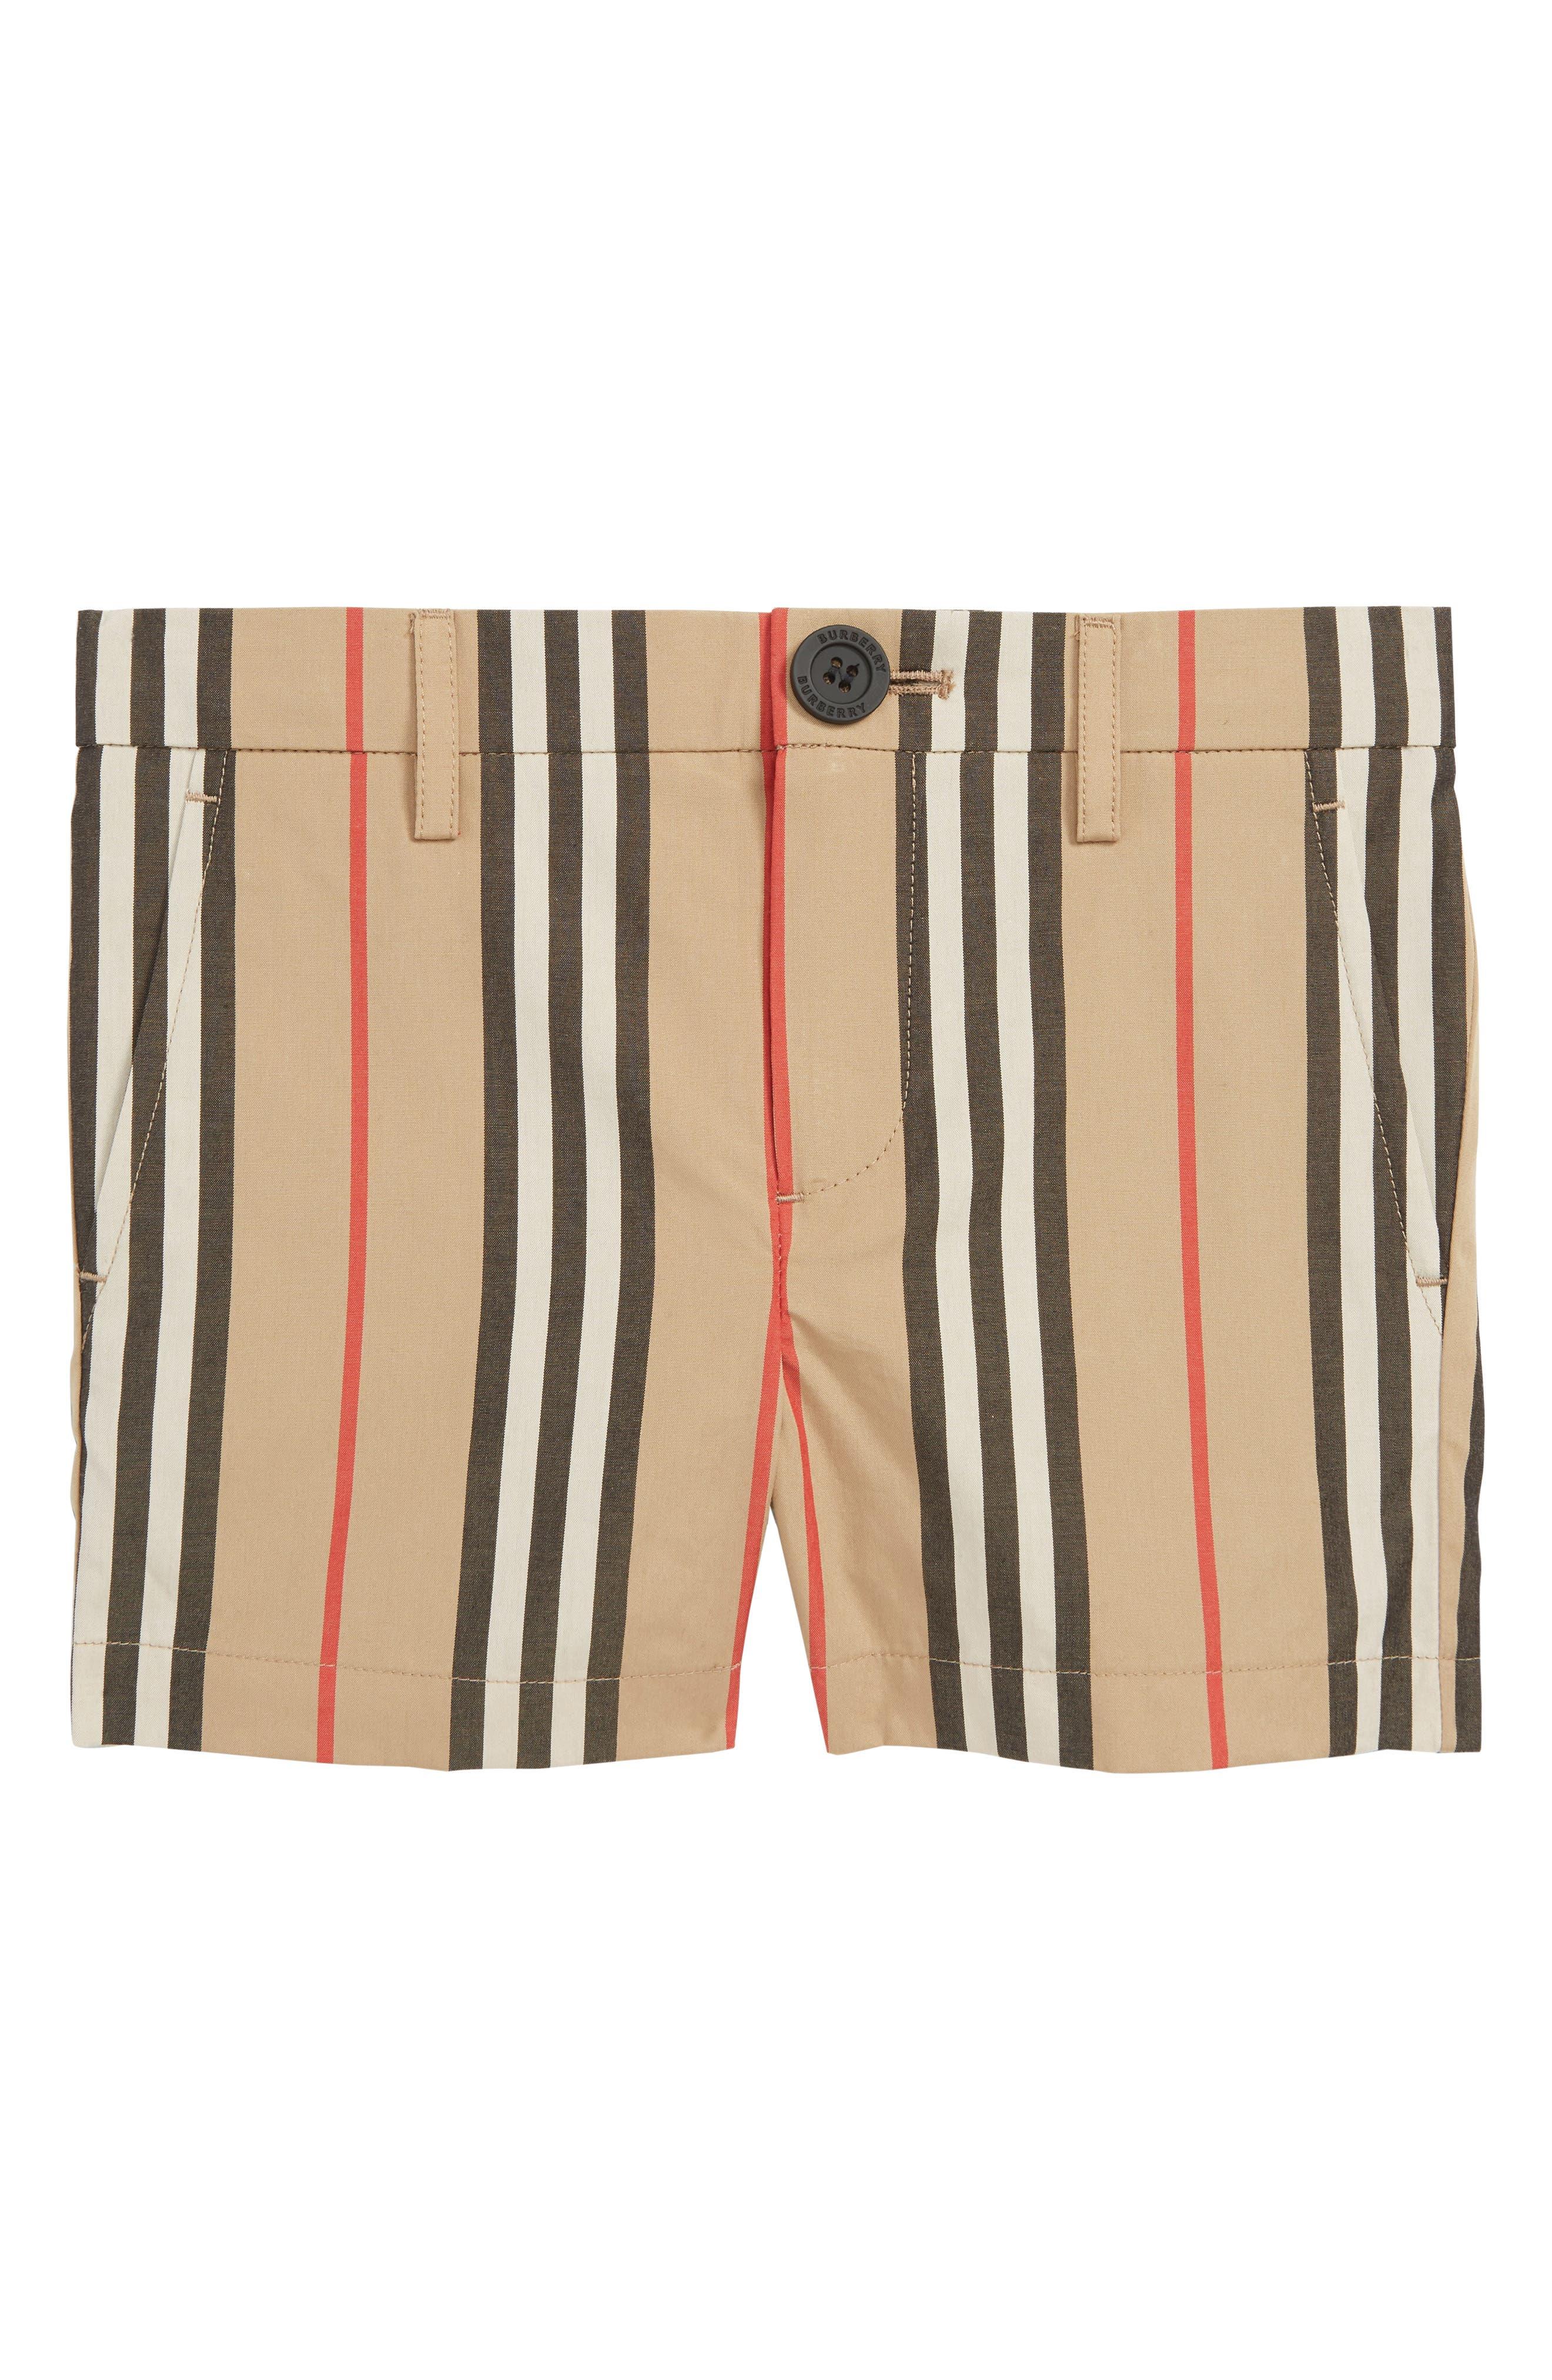 BURBERRY,                             Nicki Stripe Shorts,                             Main thumbnail 1, color,                             ARCHIVE BEIGE